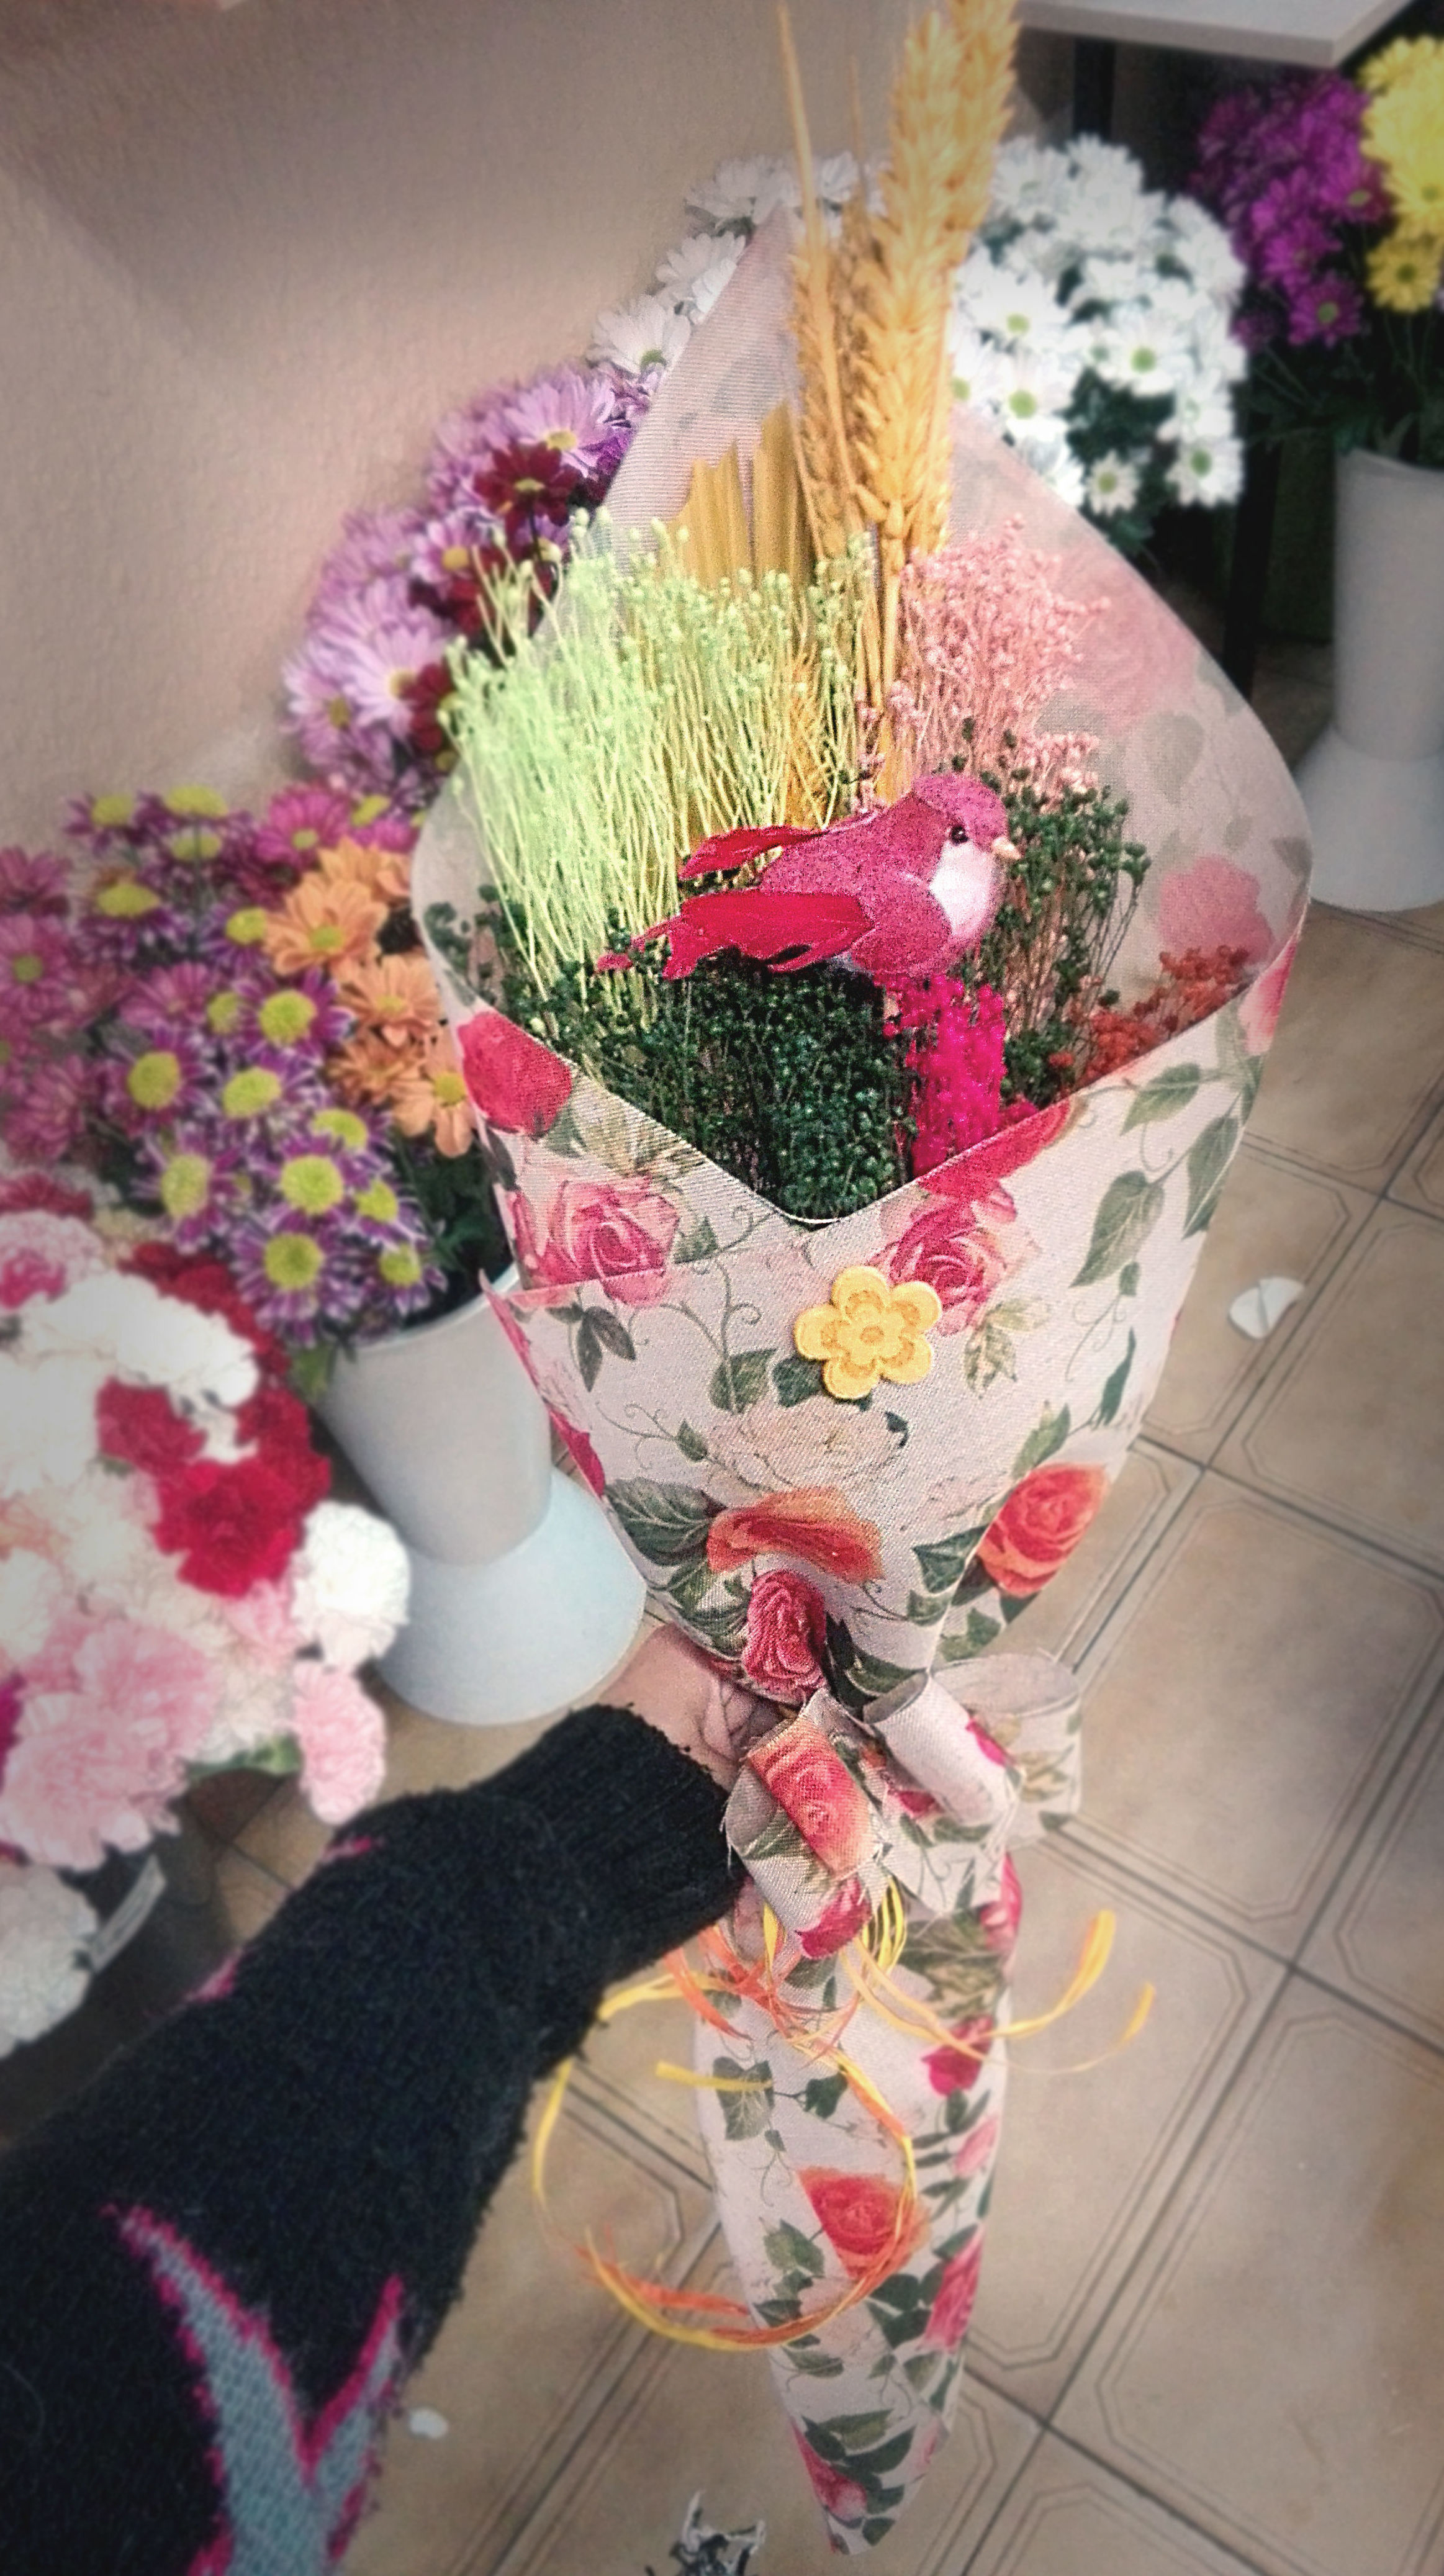 Ramos variados de flor seca